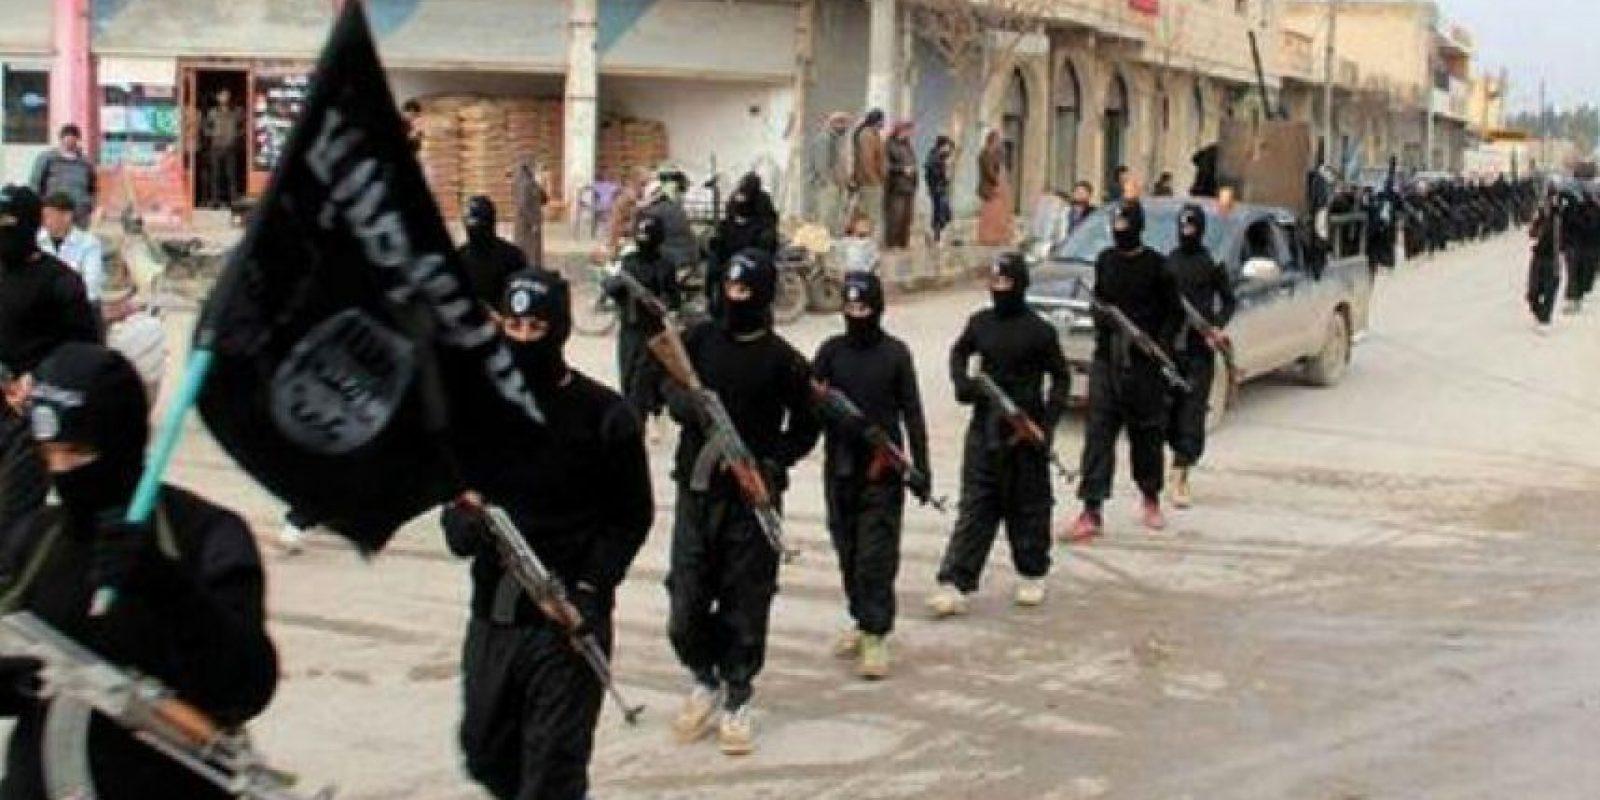 Este grupo terrorista insurgente está formado por radicales fieles a Abu Bakr al-Baghdadi. Foto:AP. Imagen Por: